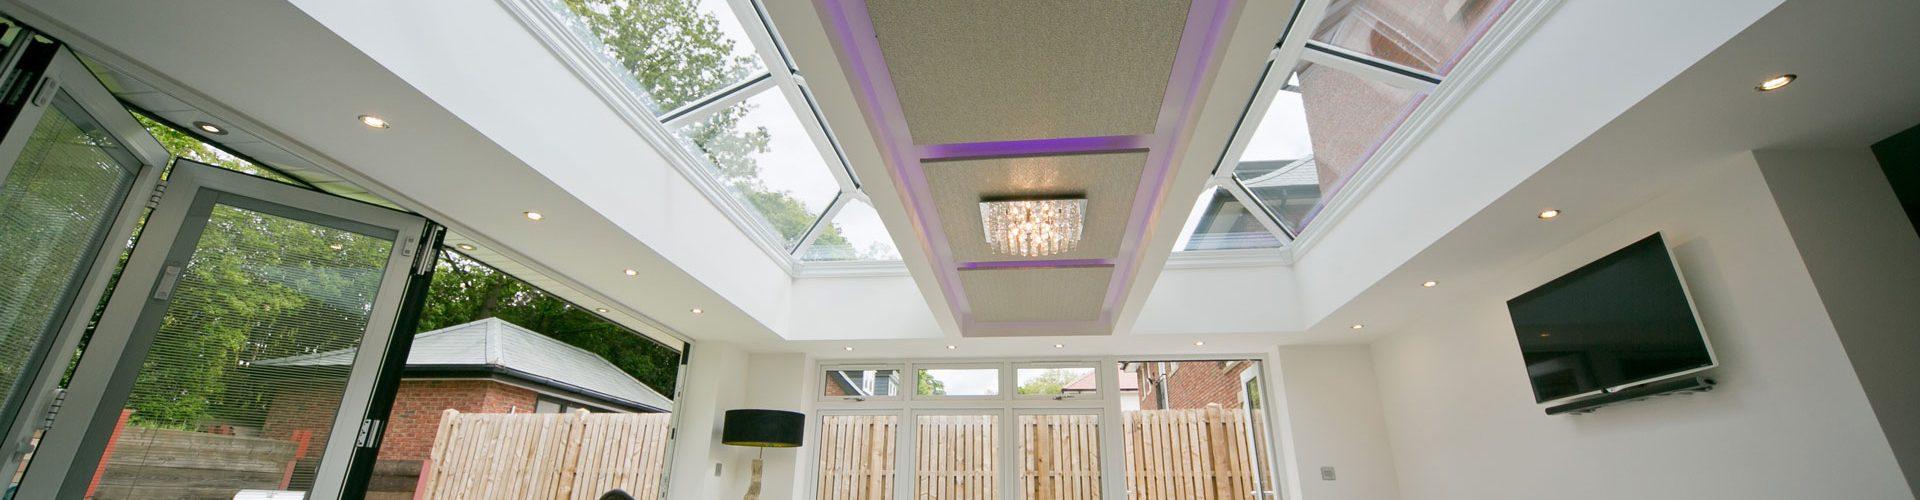 Ultraframe Roof Lanterns Stevenage